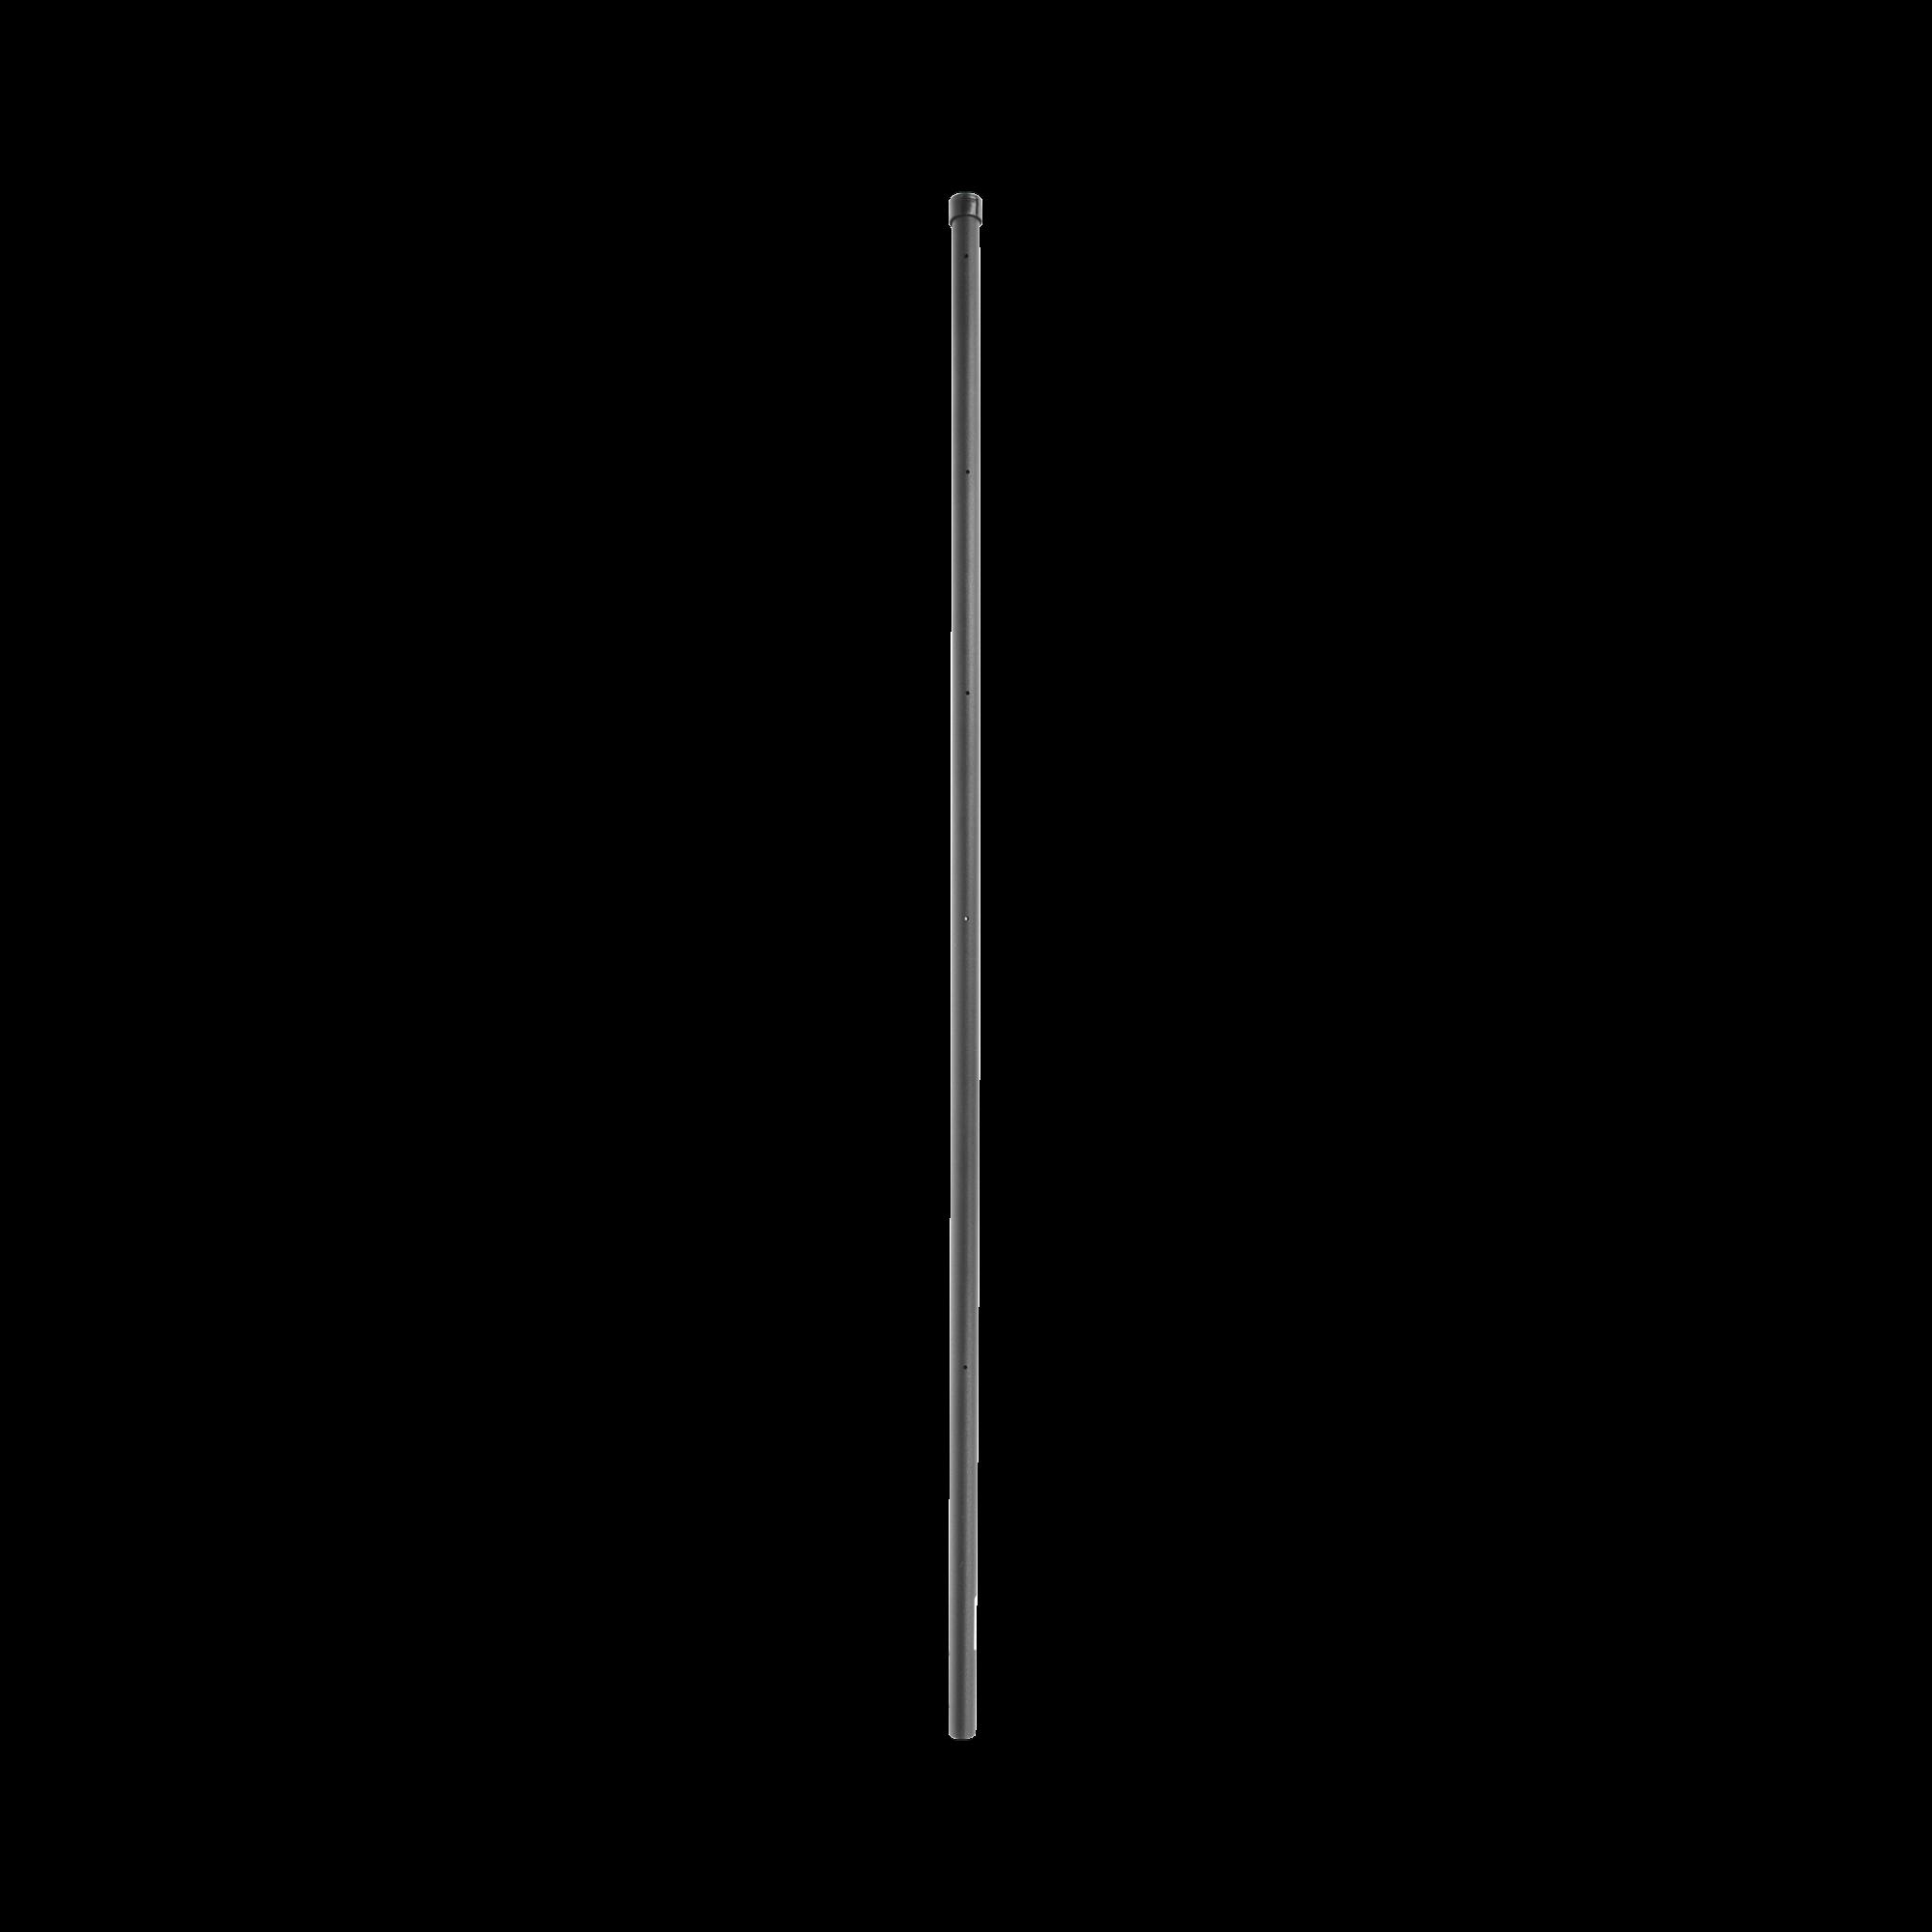 Poste de ESQUINA para Cerca Electrificada. Tubo Galva. de 1.5m, cal. 18 de 1 Diam. + Pintura Negra, ideal para 6 Aisladores